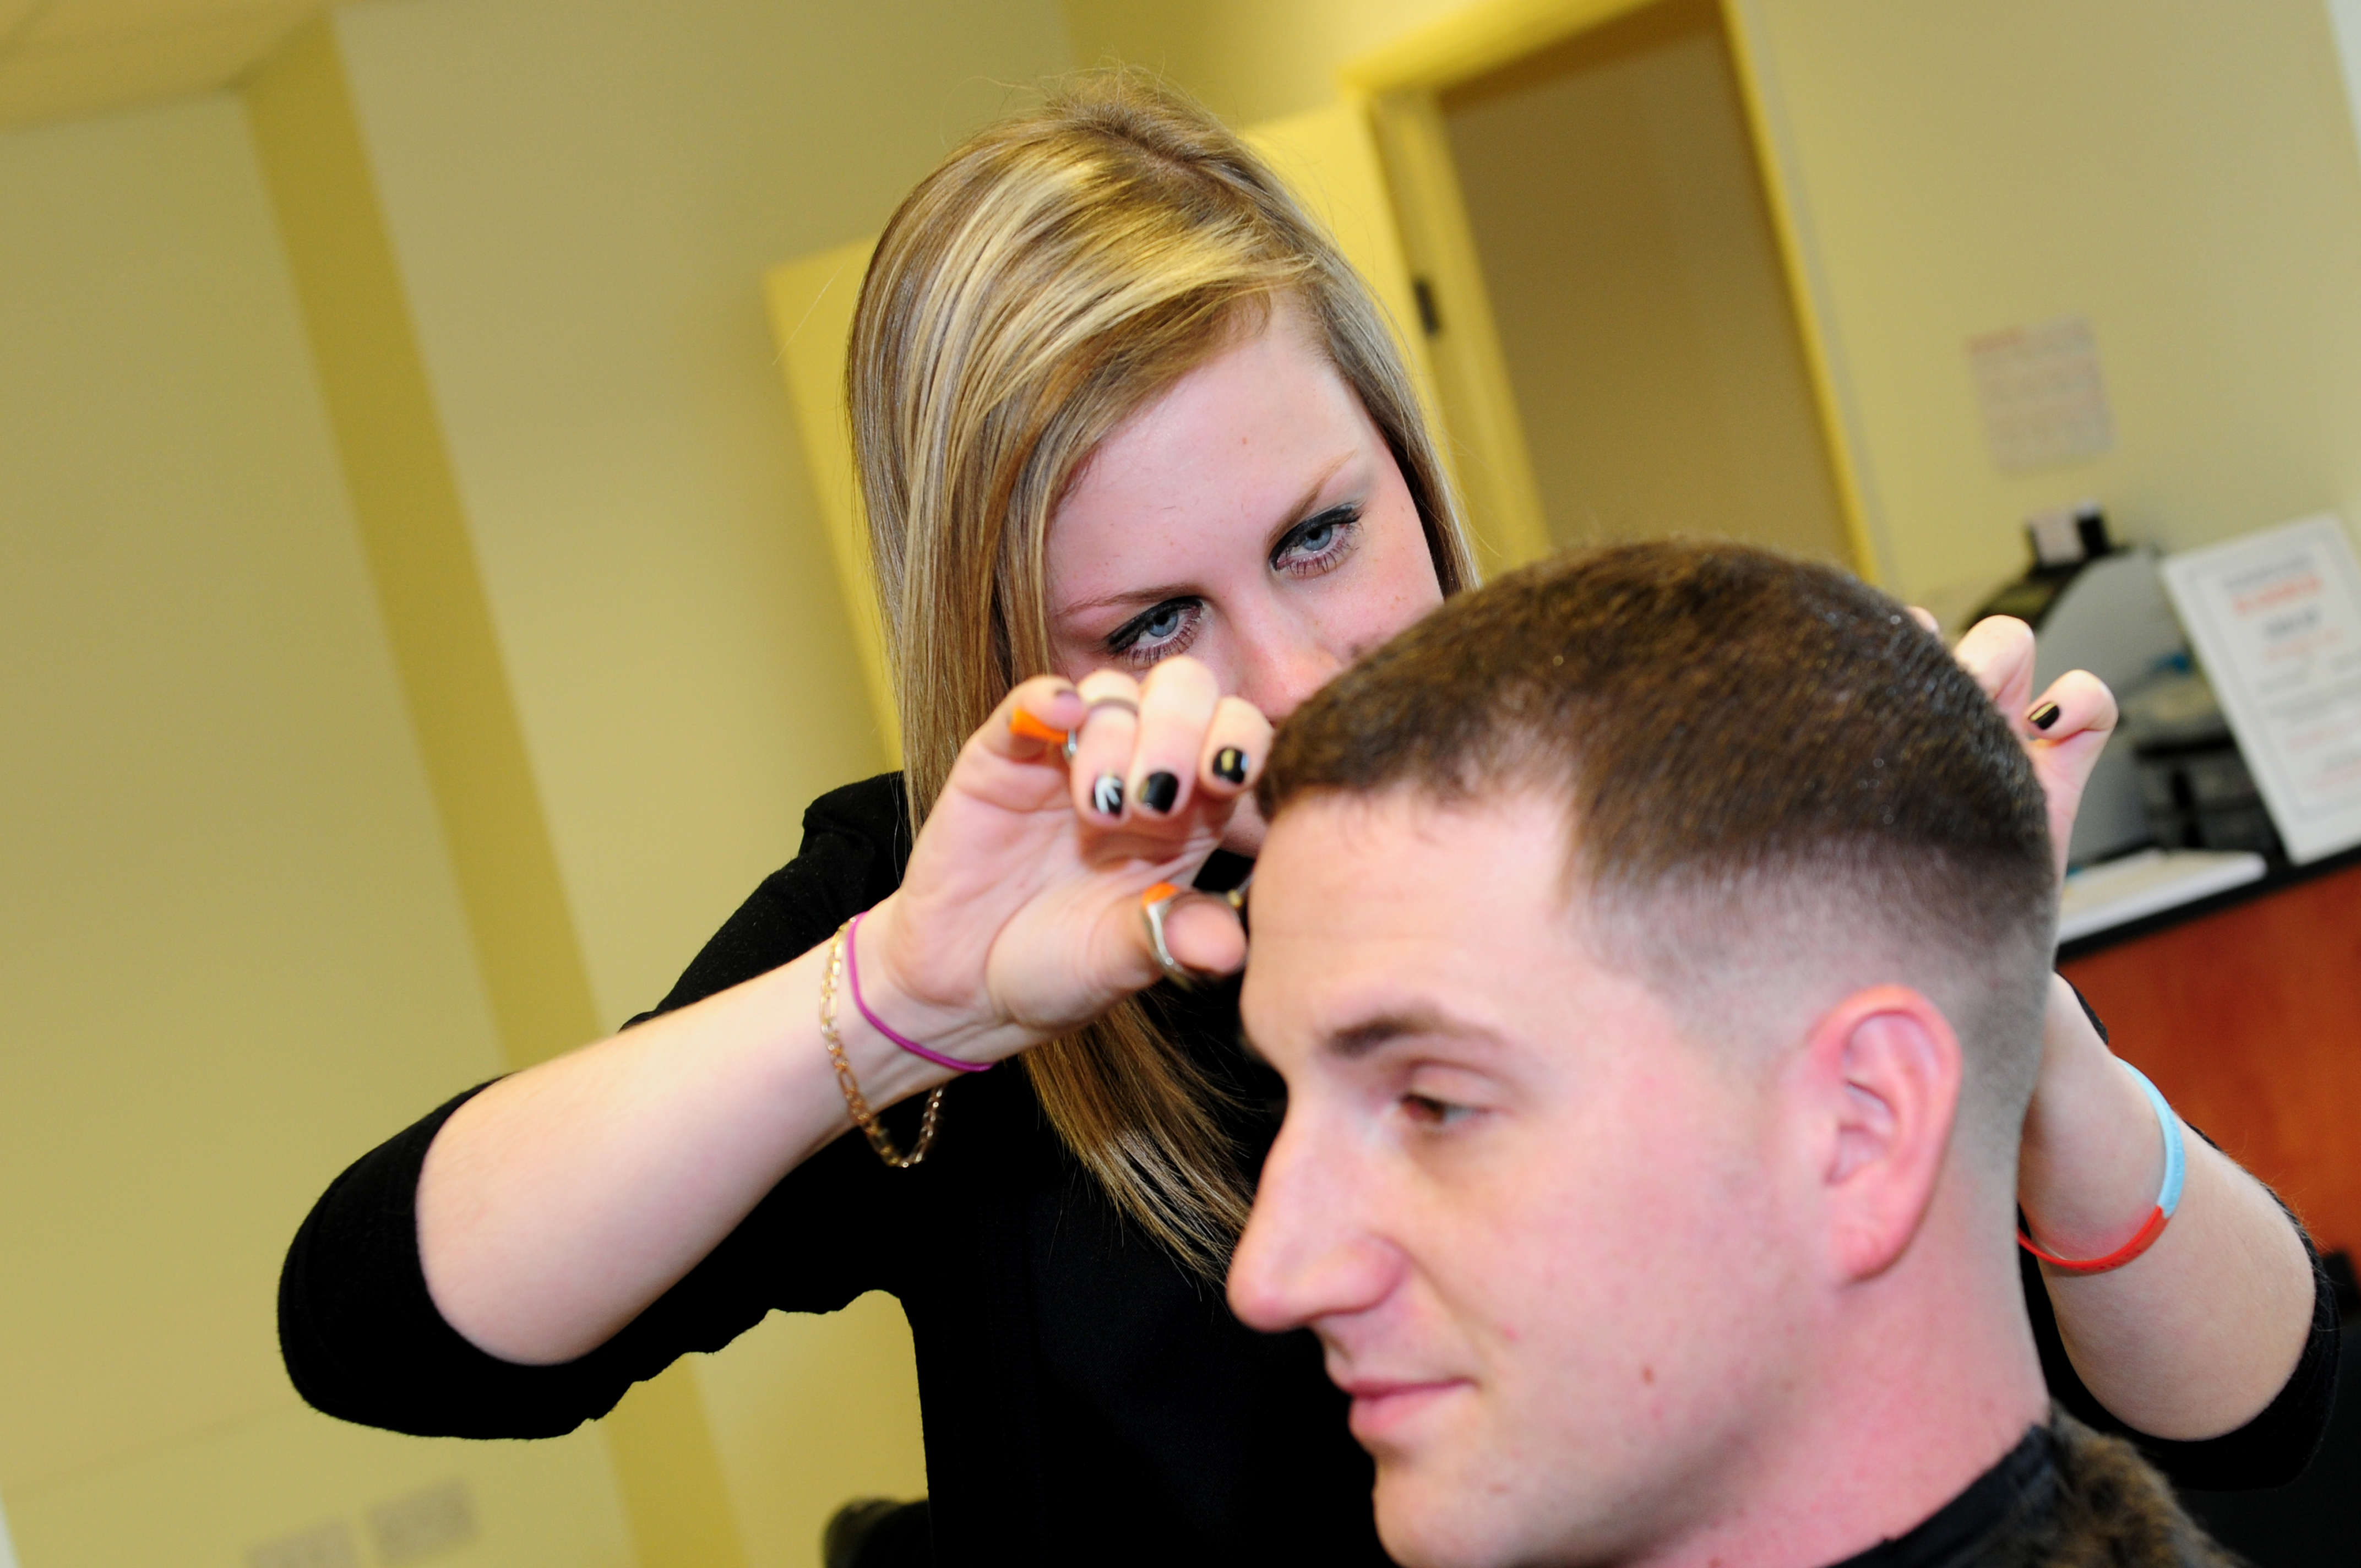 Need A Haircut Youve Got Options Royal Air Force Lakenheath